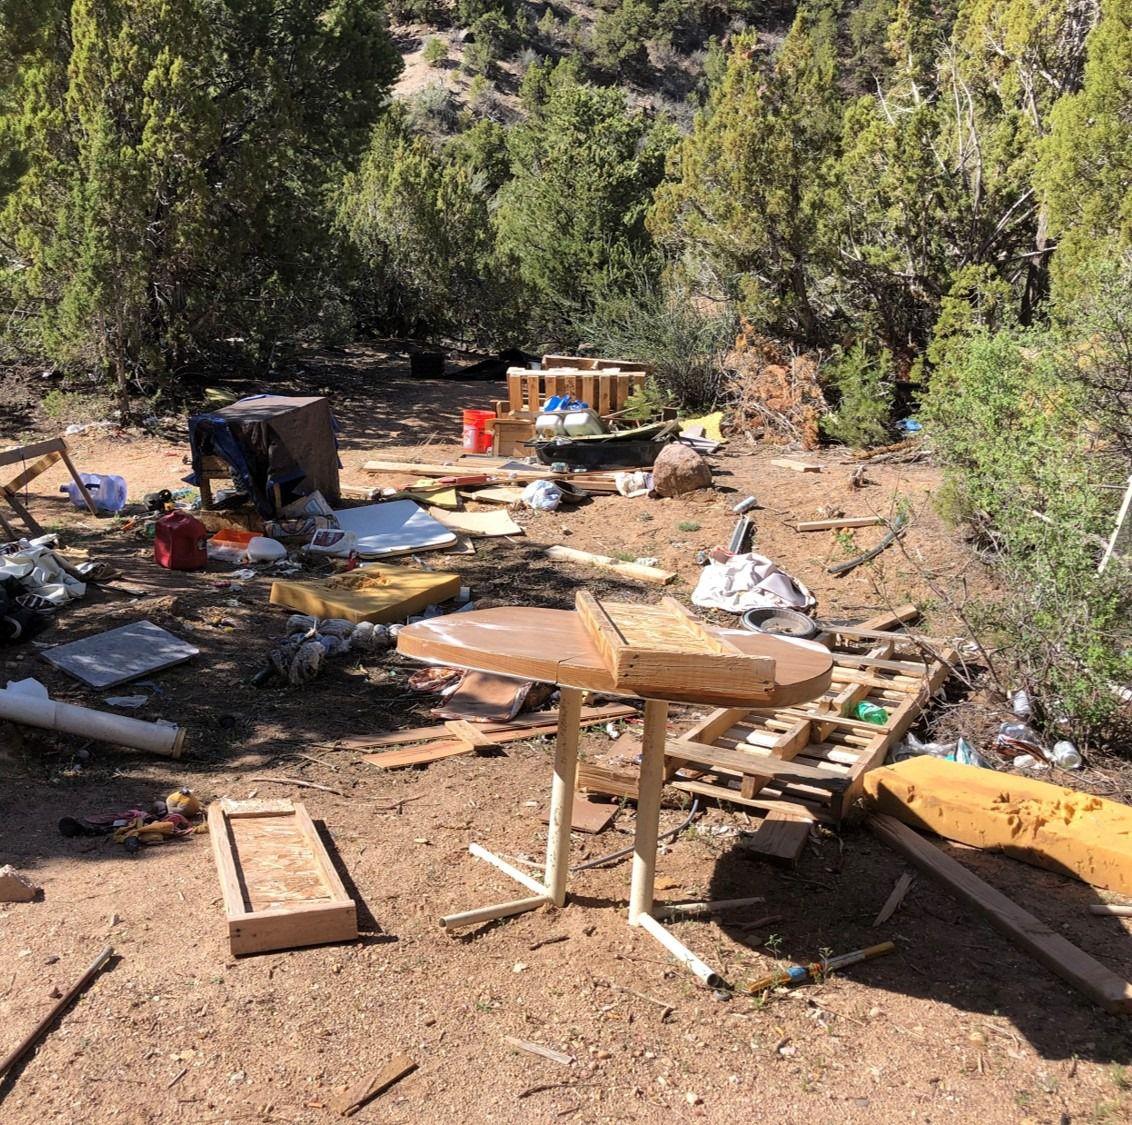 Trash that was left behind at a campsite on Bureau of Land Management land.